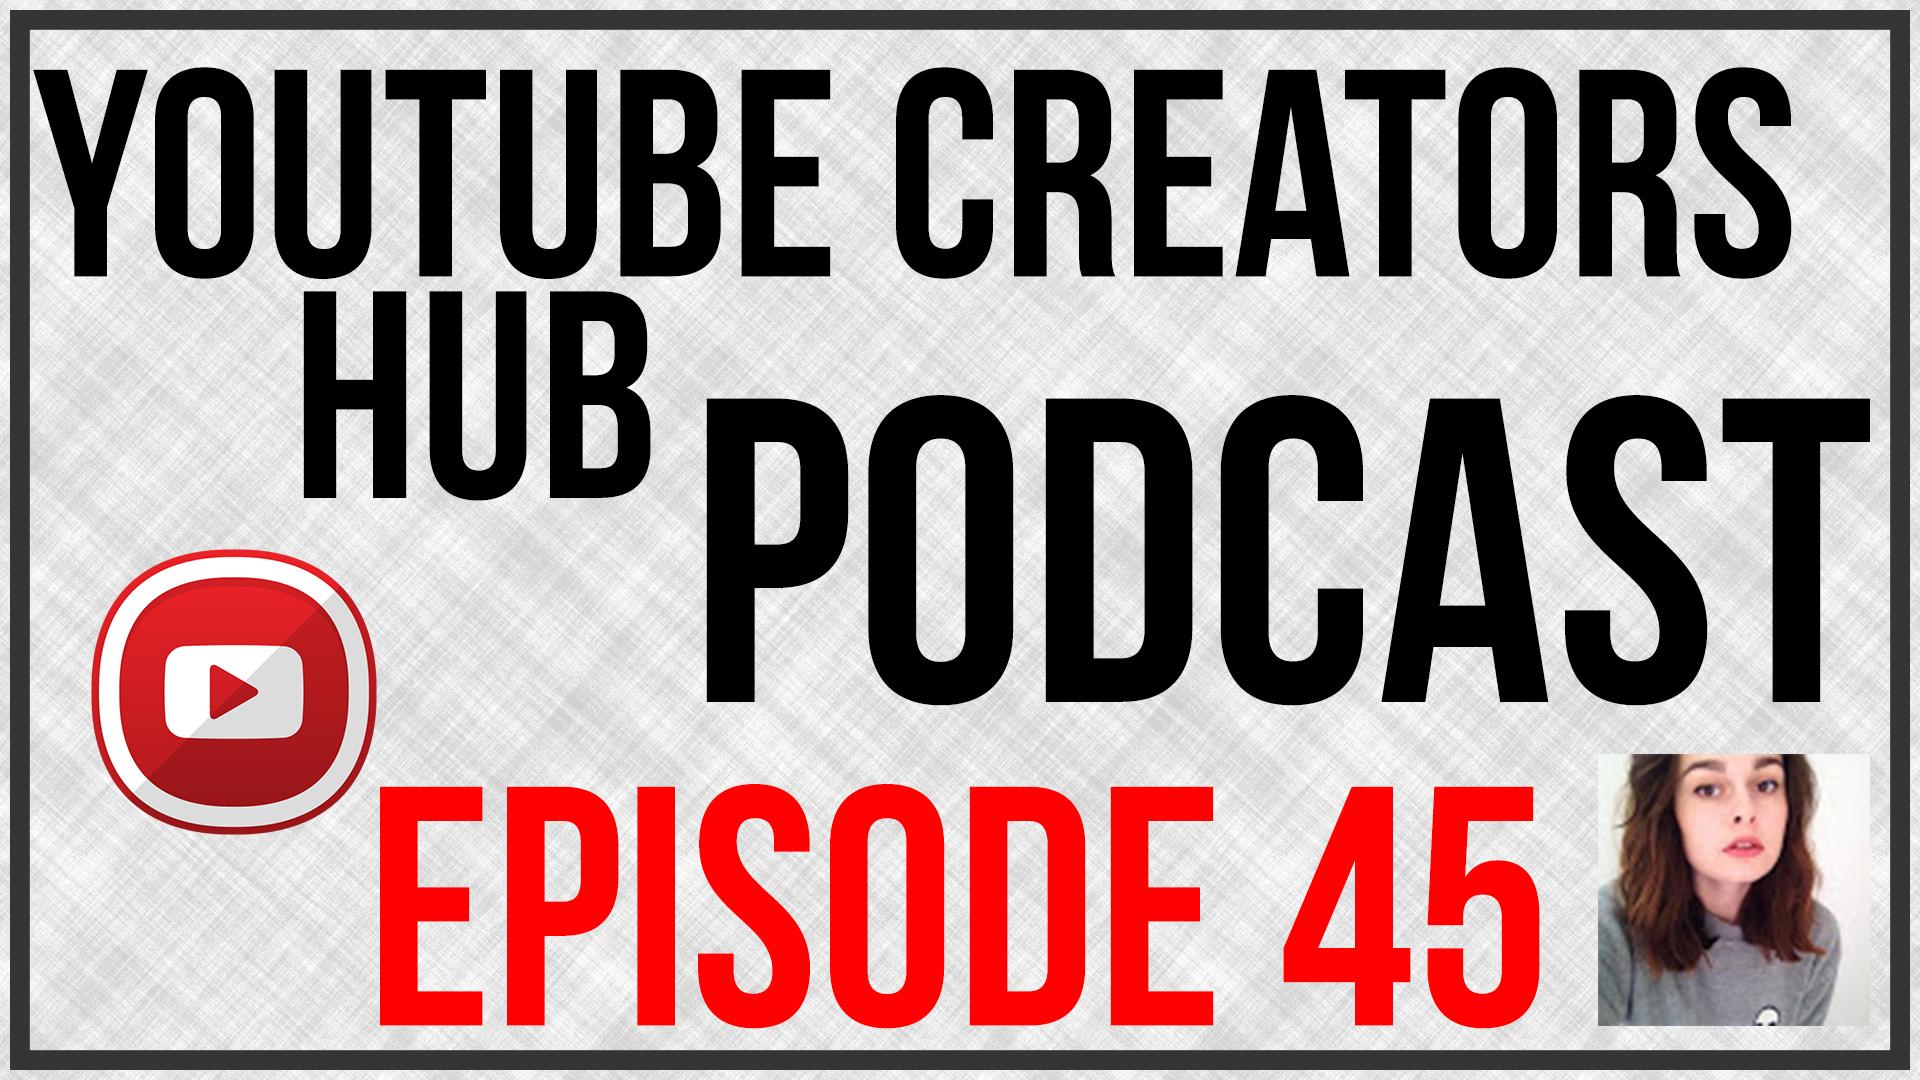 YouTube Creators Hub Podcast Episode 45